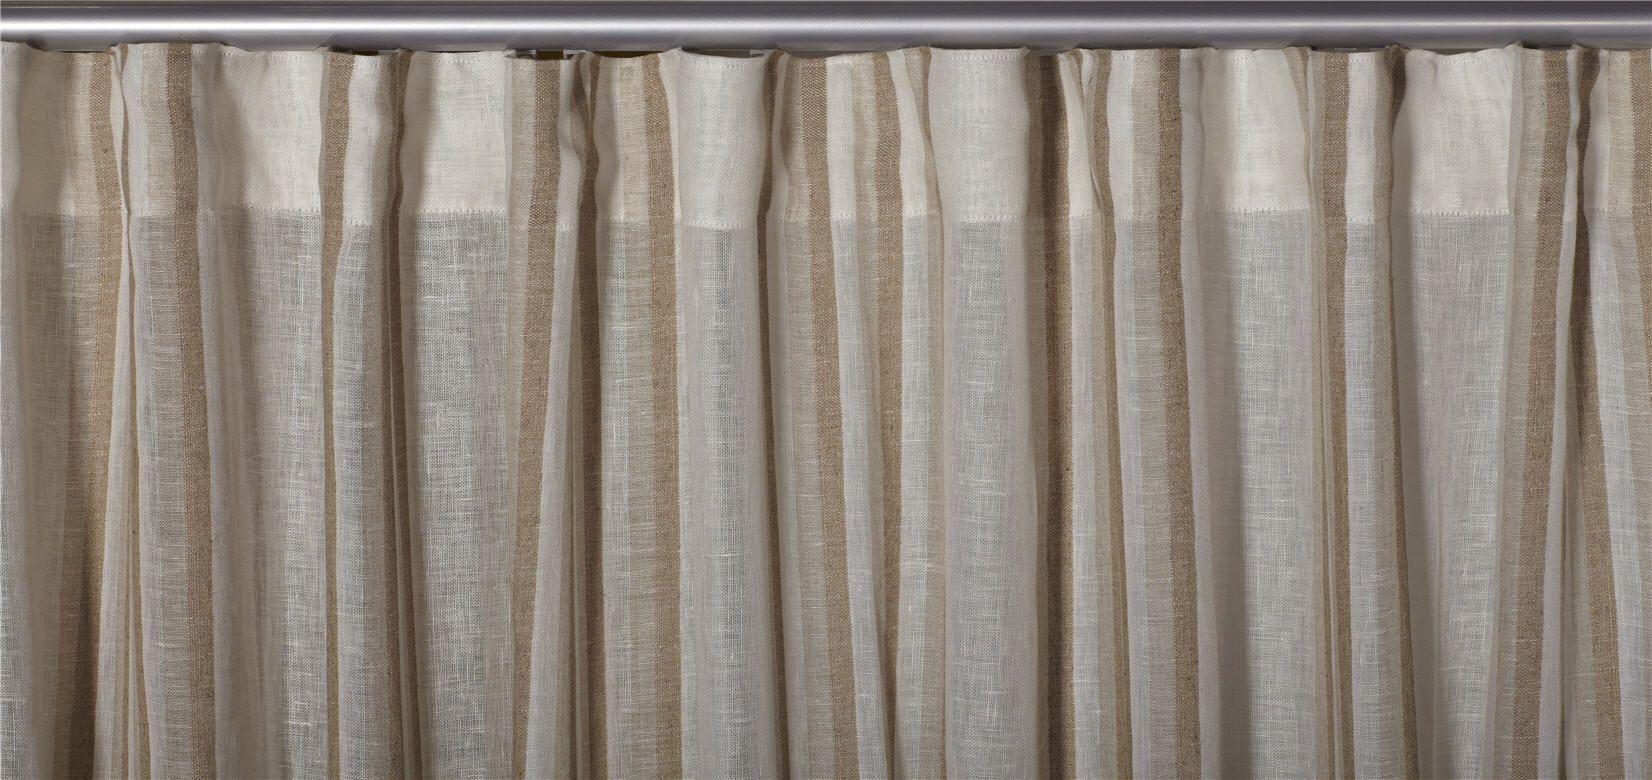 Linen Striped Sheer Drapery Fabric La Croisette By Charles